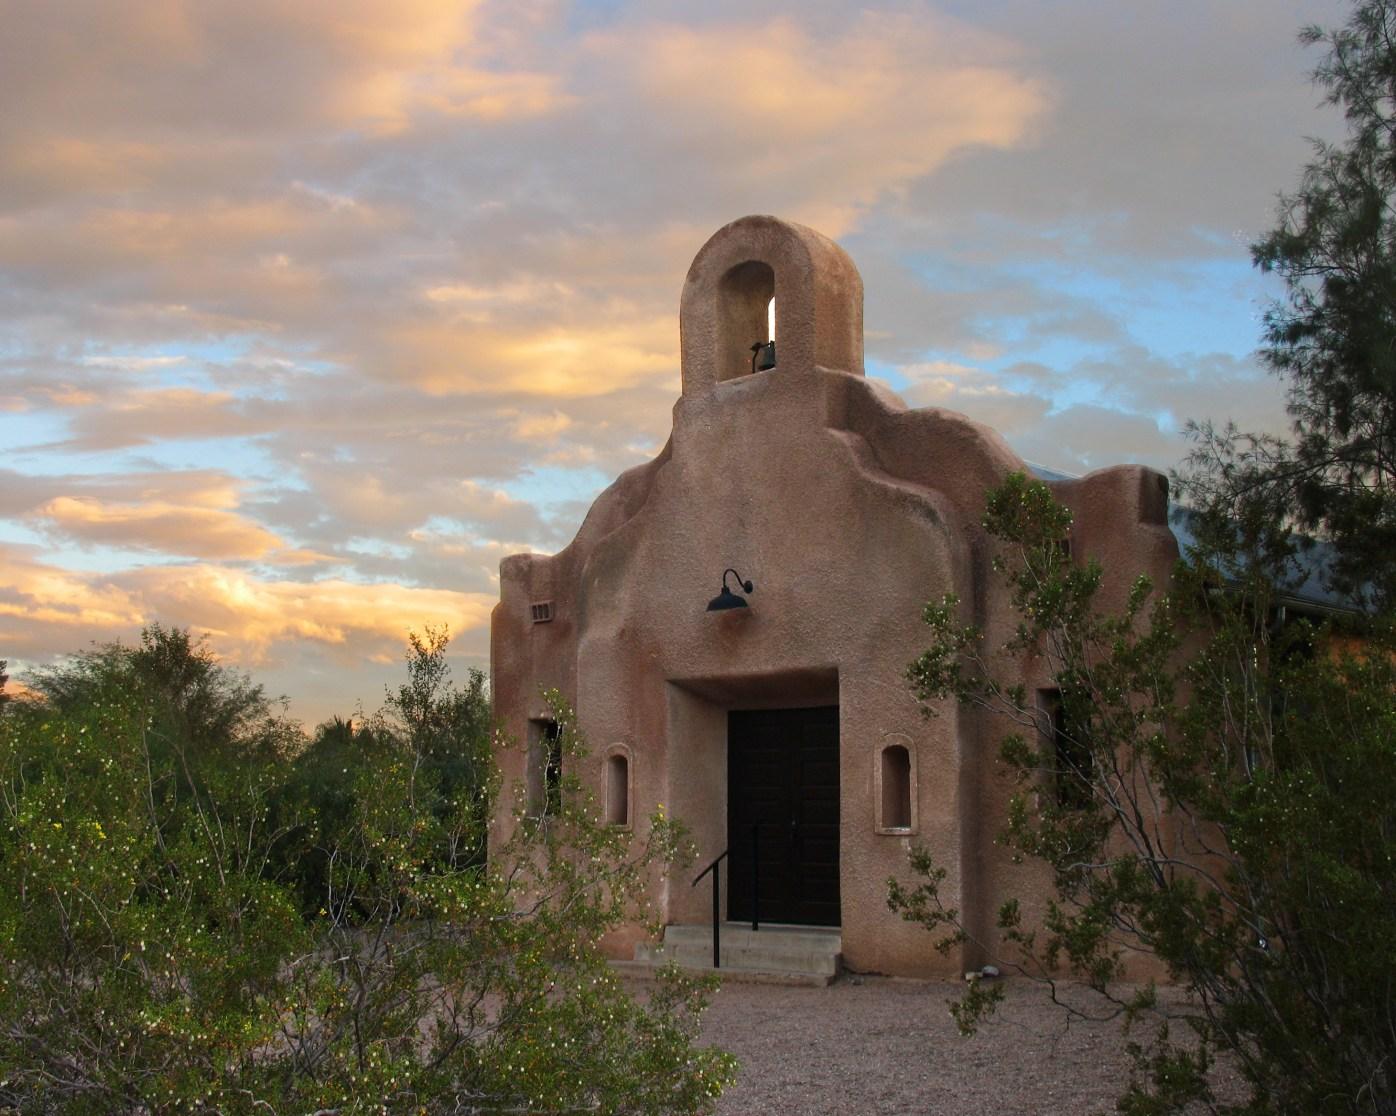 Photo by Bill Roach, Tucson photographer